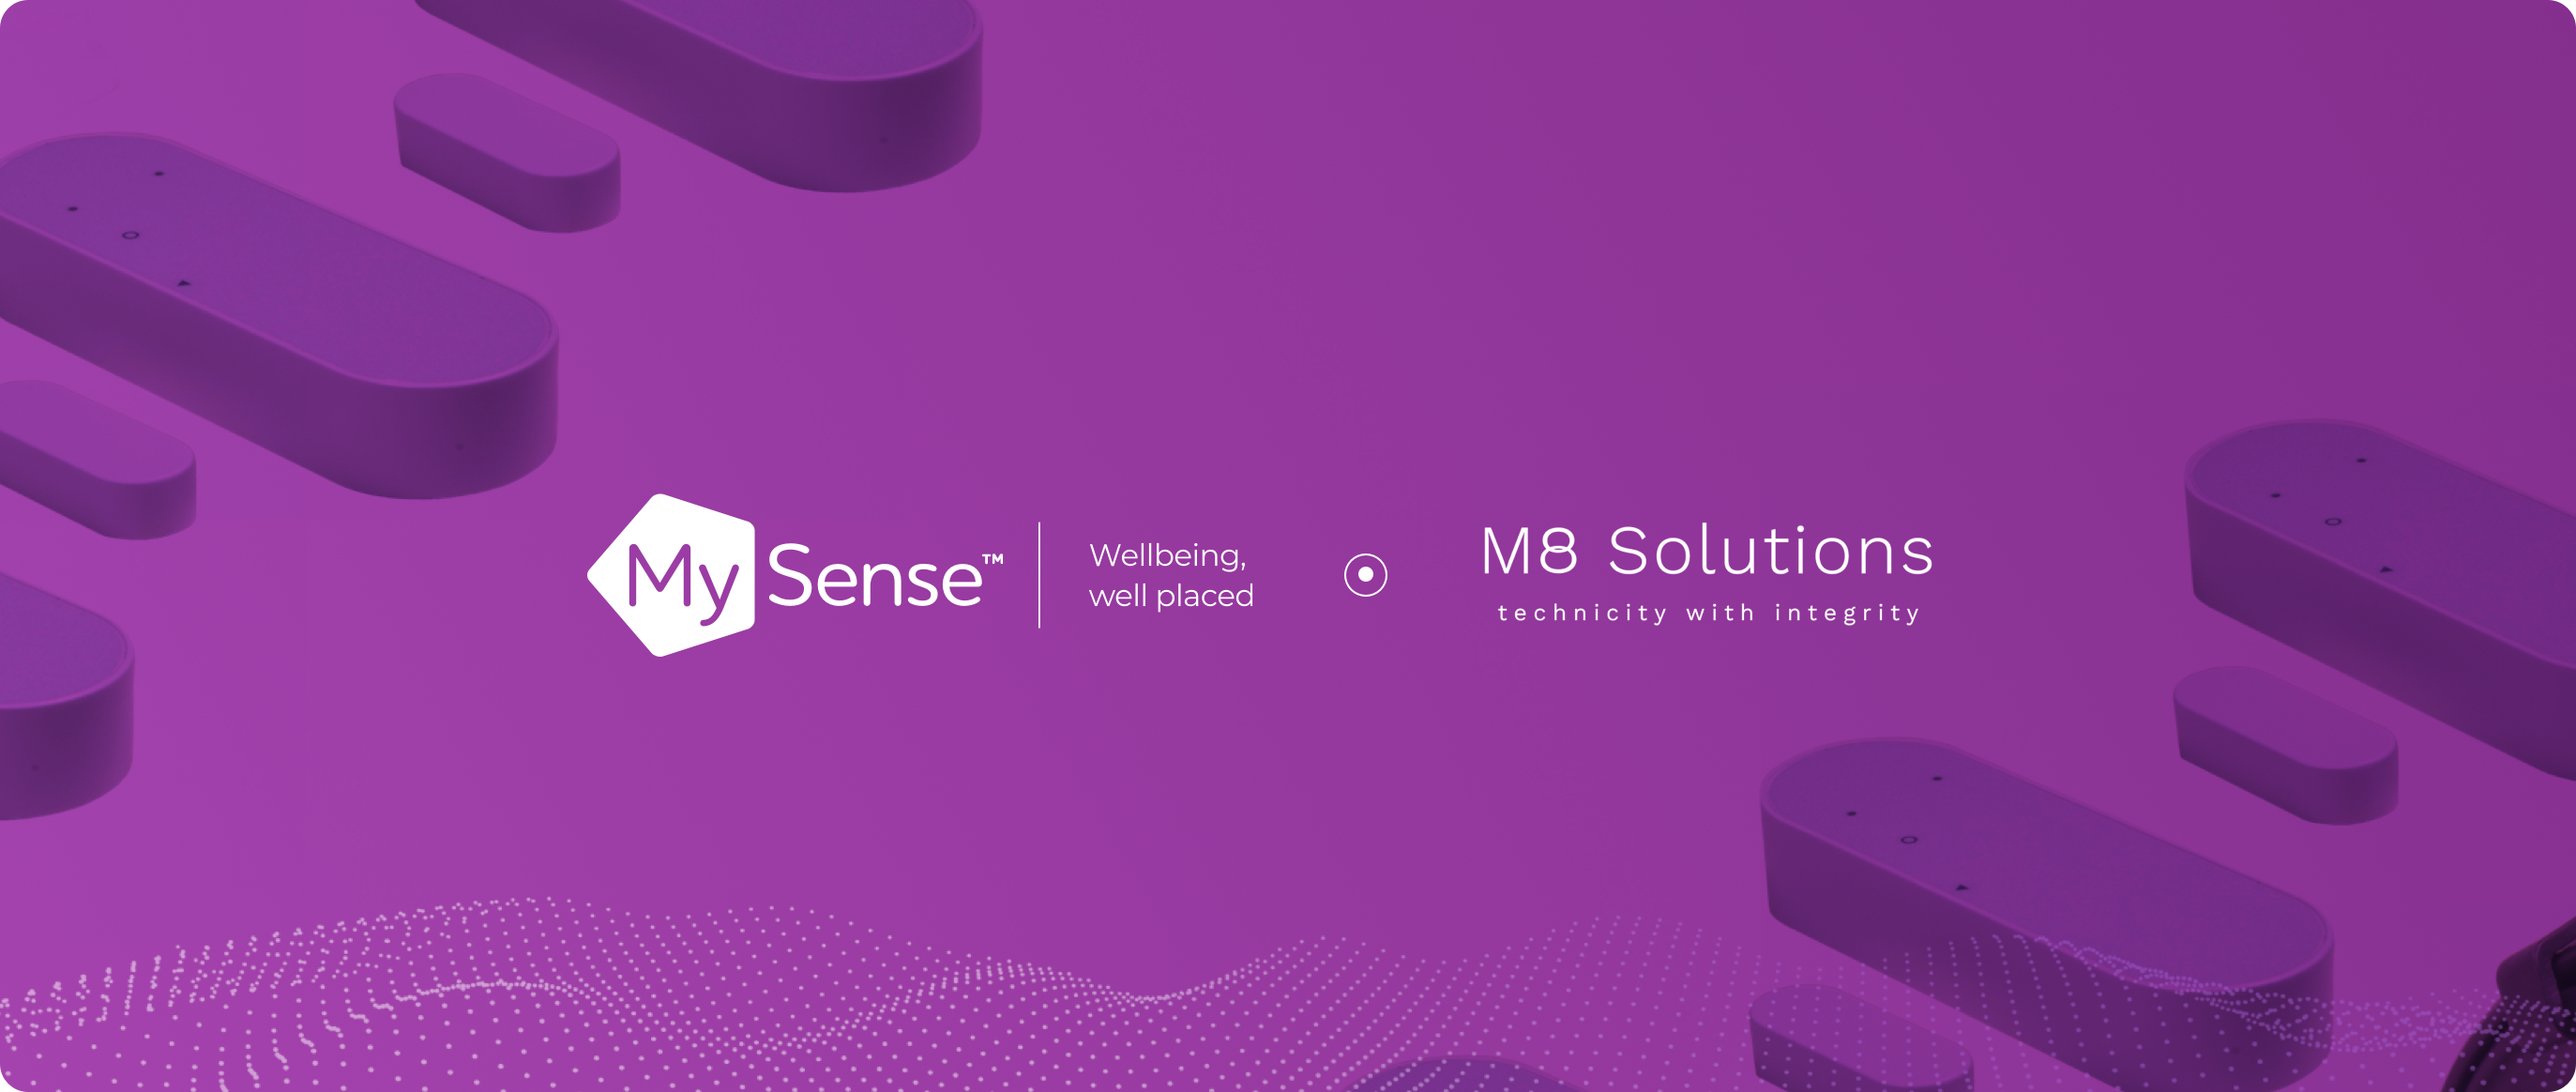 MySense M8 Solutions Logos